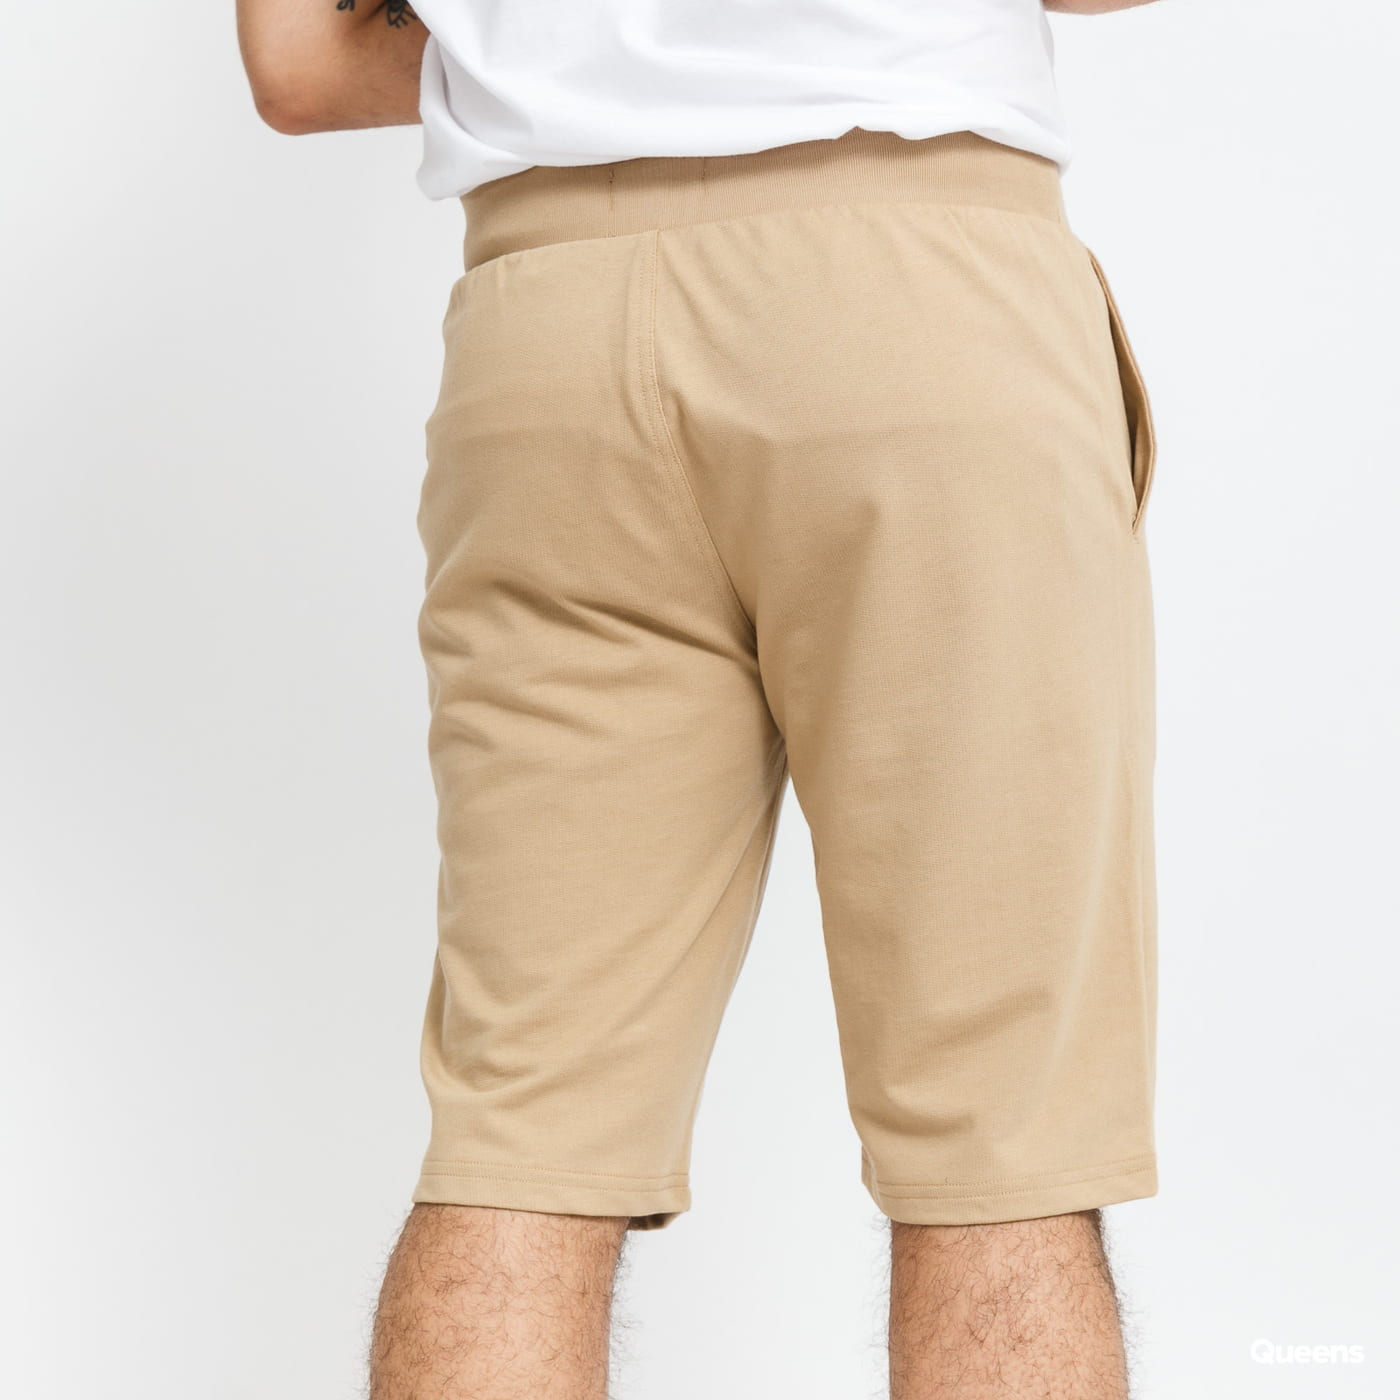 Polo Ralph Lauren Slim Short béžové